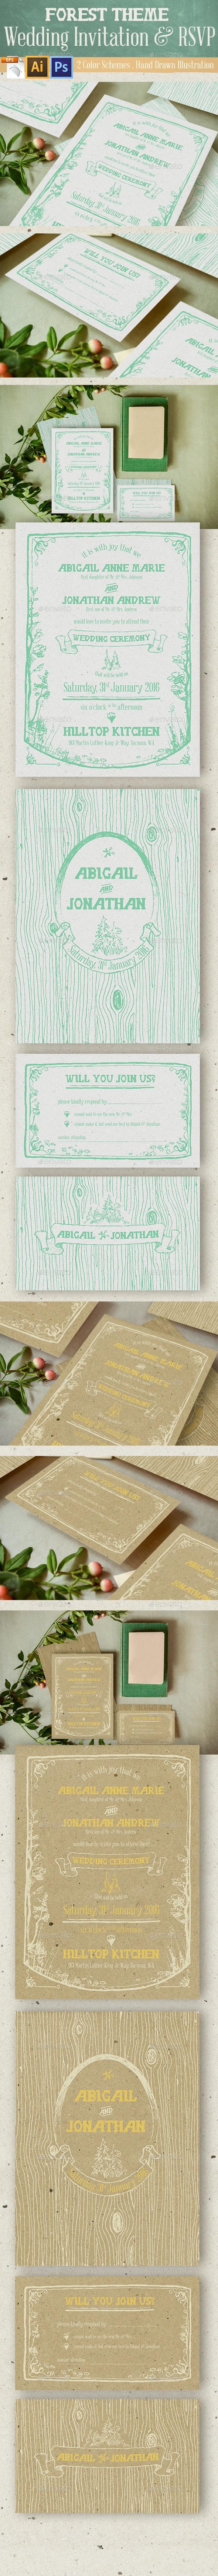 Forest Theme Wedding Invitation - Weddings Cards & Invites